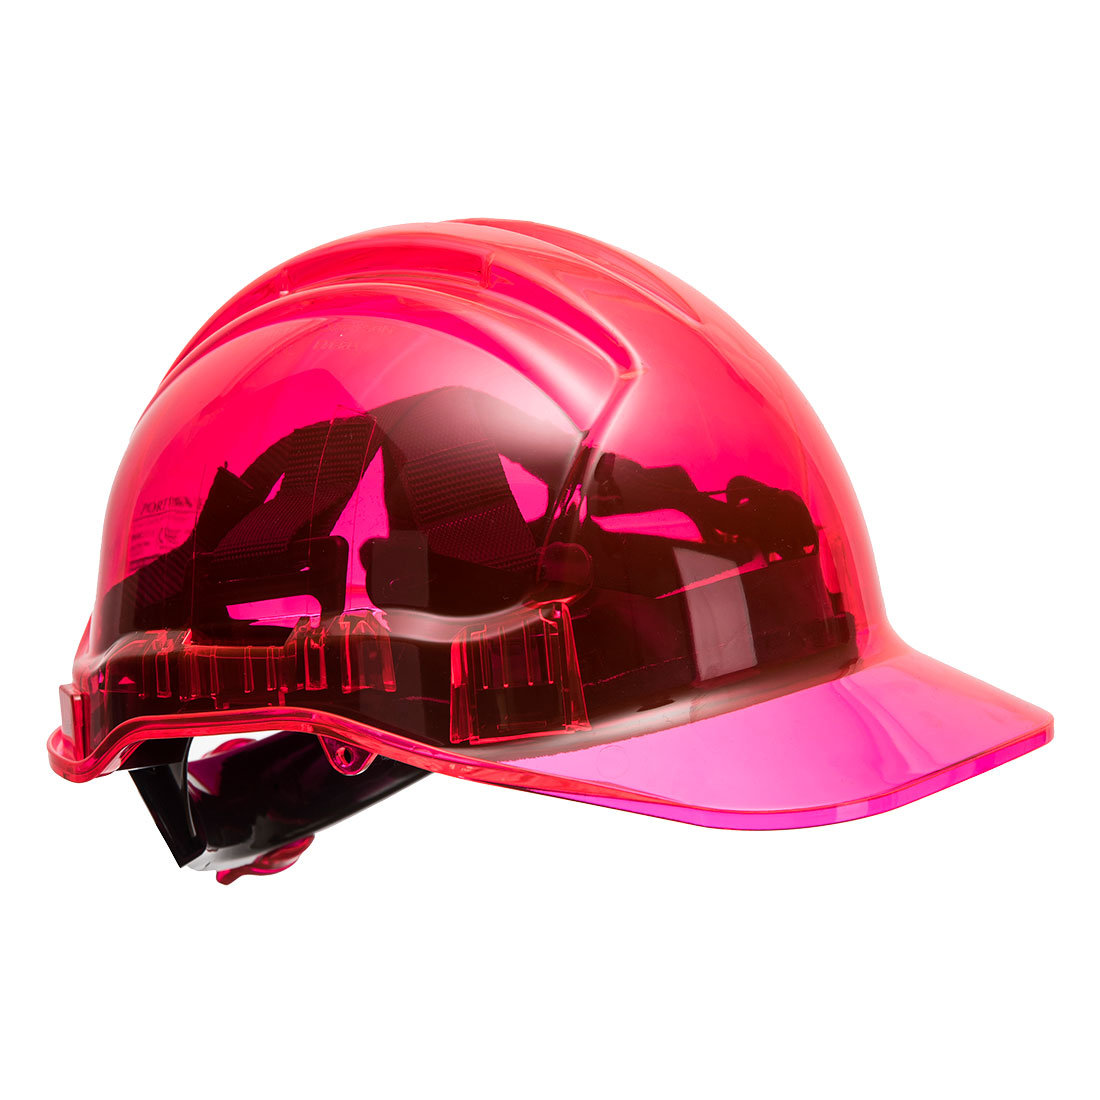 Portwest PV64 Translucent Peak View Ratchet Hard Hat, Pink  R/Fit